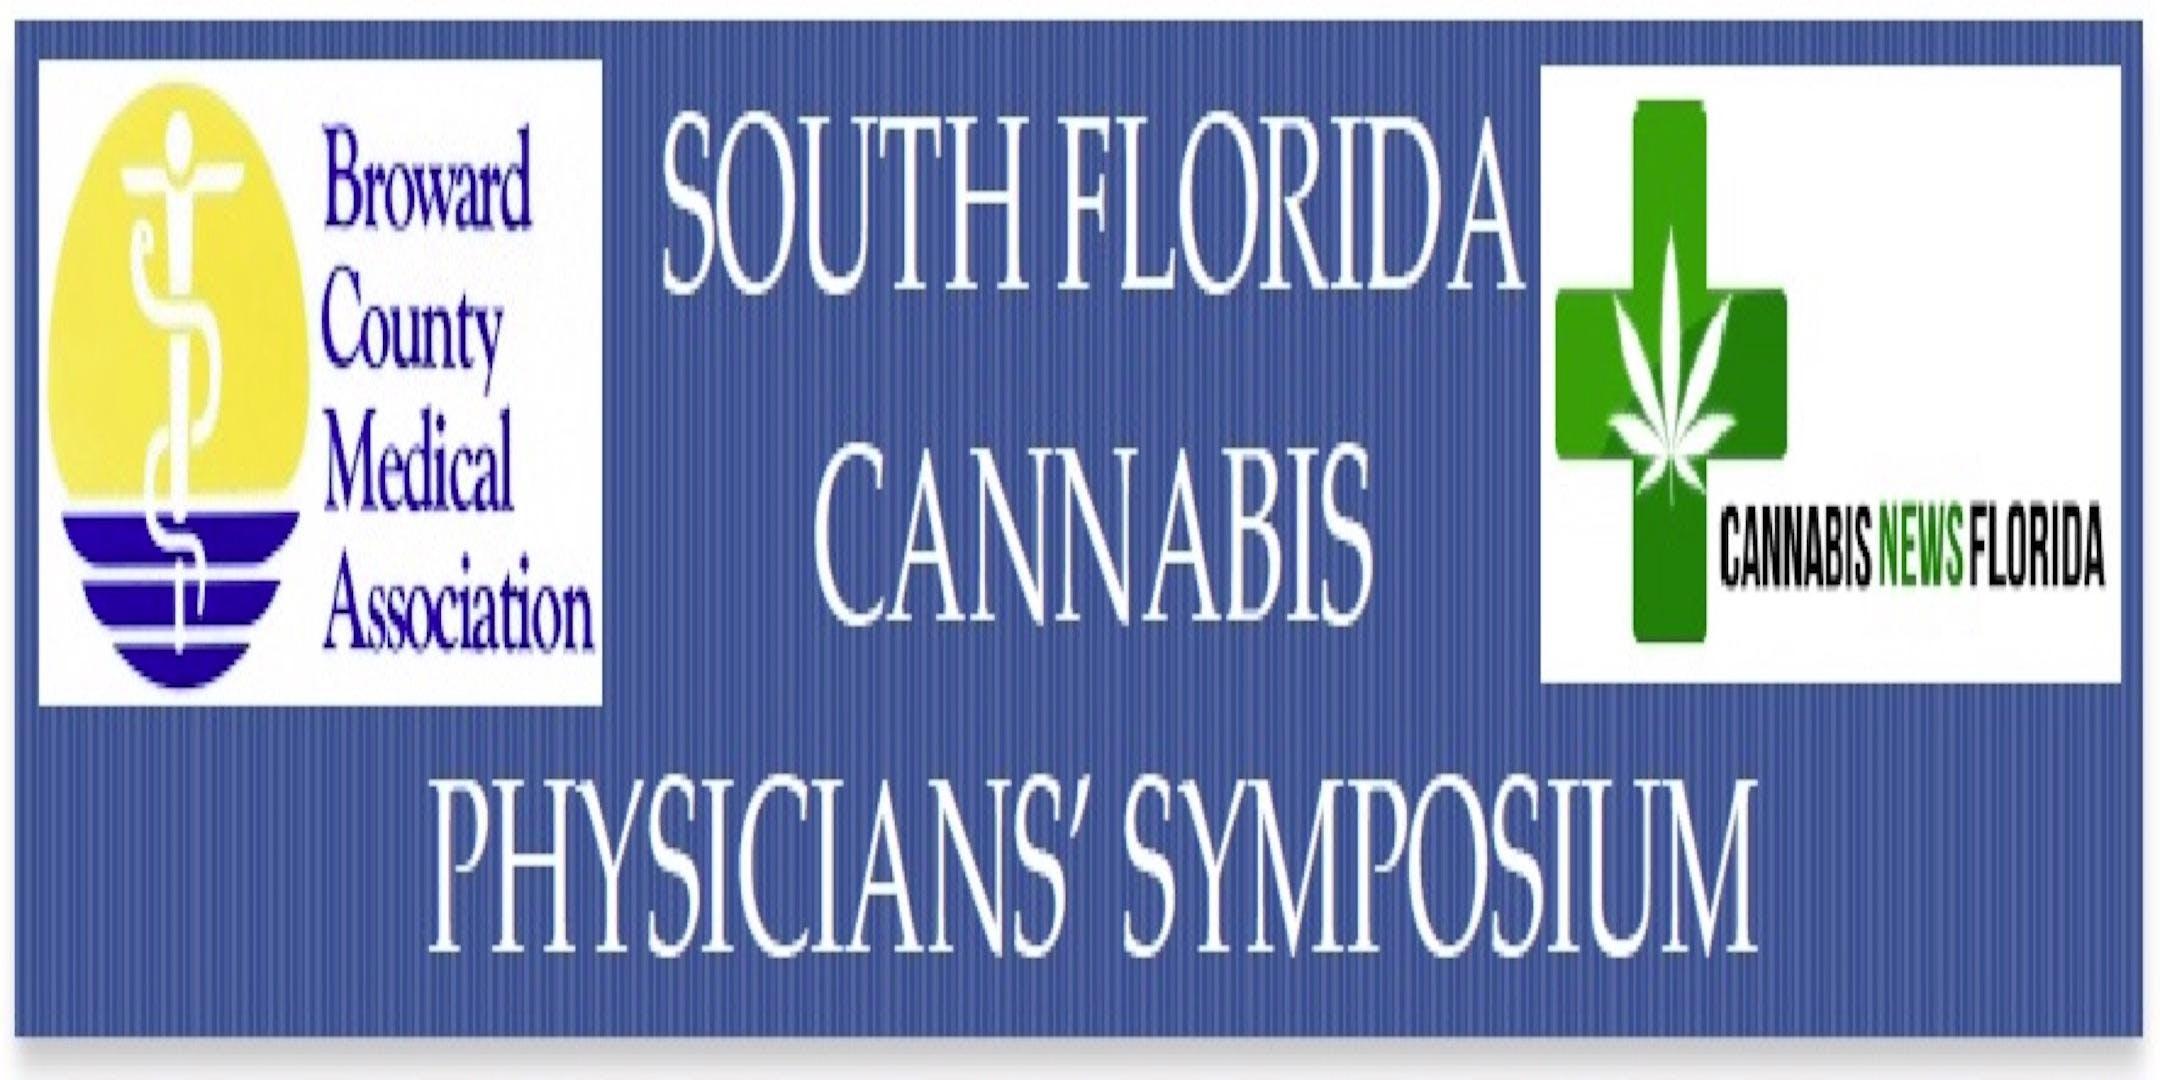 South Florida Cannabis Events